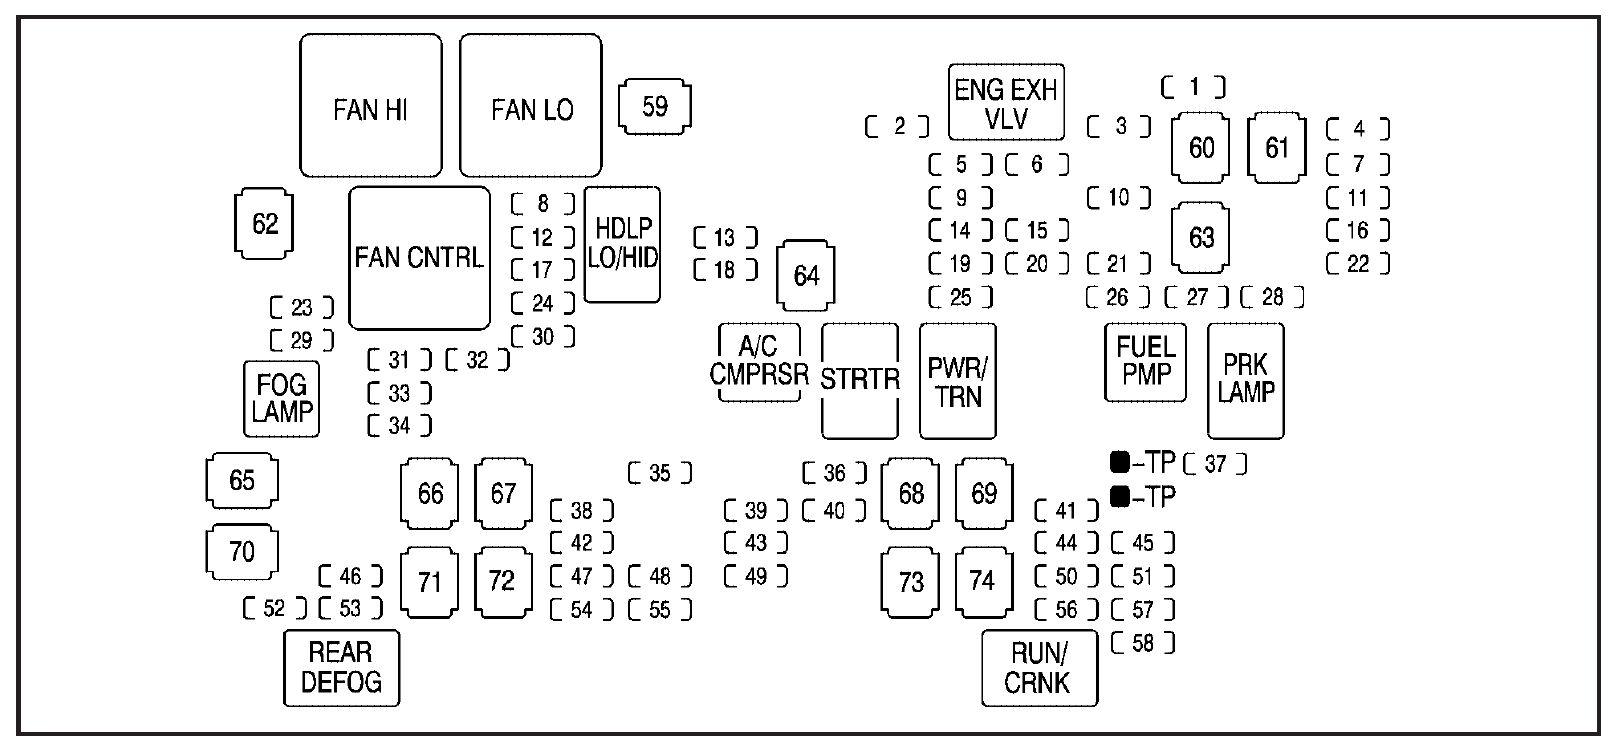 OO_2894] 2007 Gmc Yukon Engine Diagram Download Diagram   2007 Yukon Fuse Diagram      Boapu Seme Inrebe Mohammedshrine Librar Wiring 101